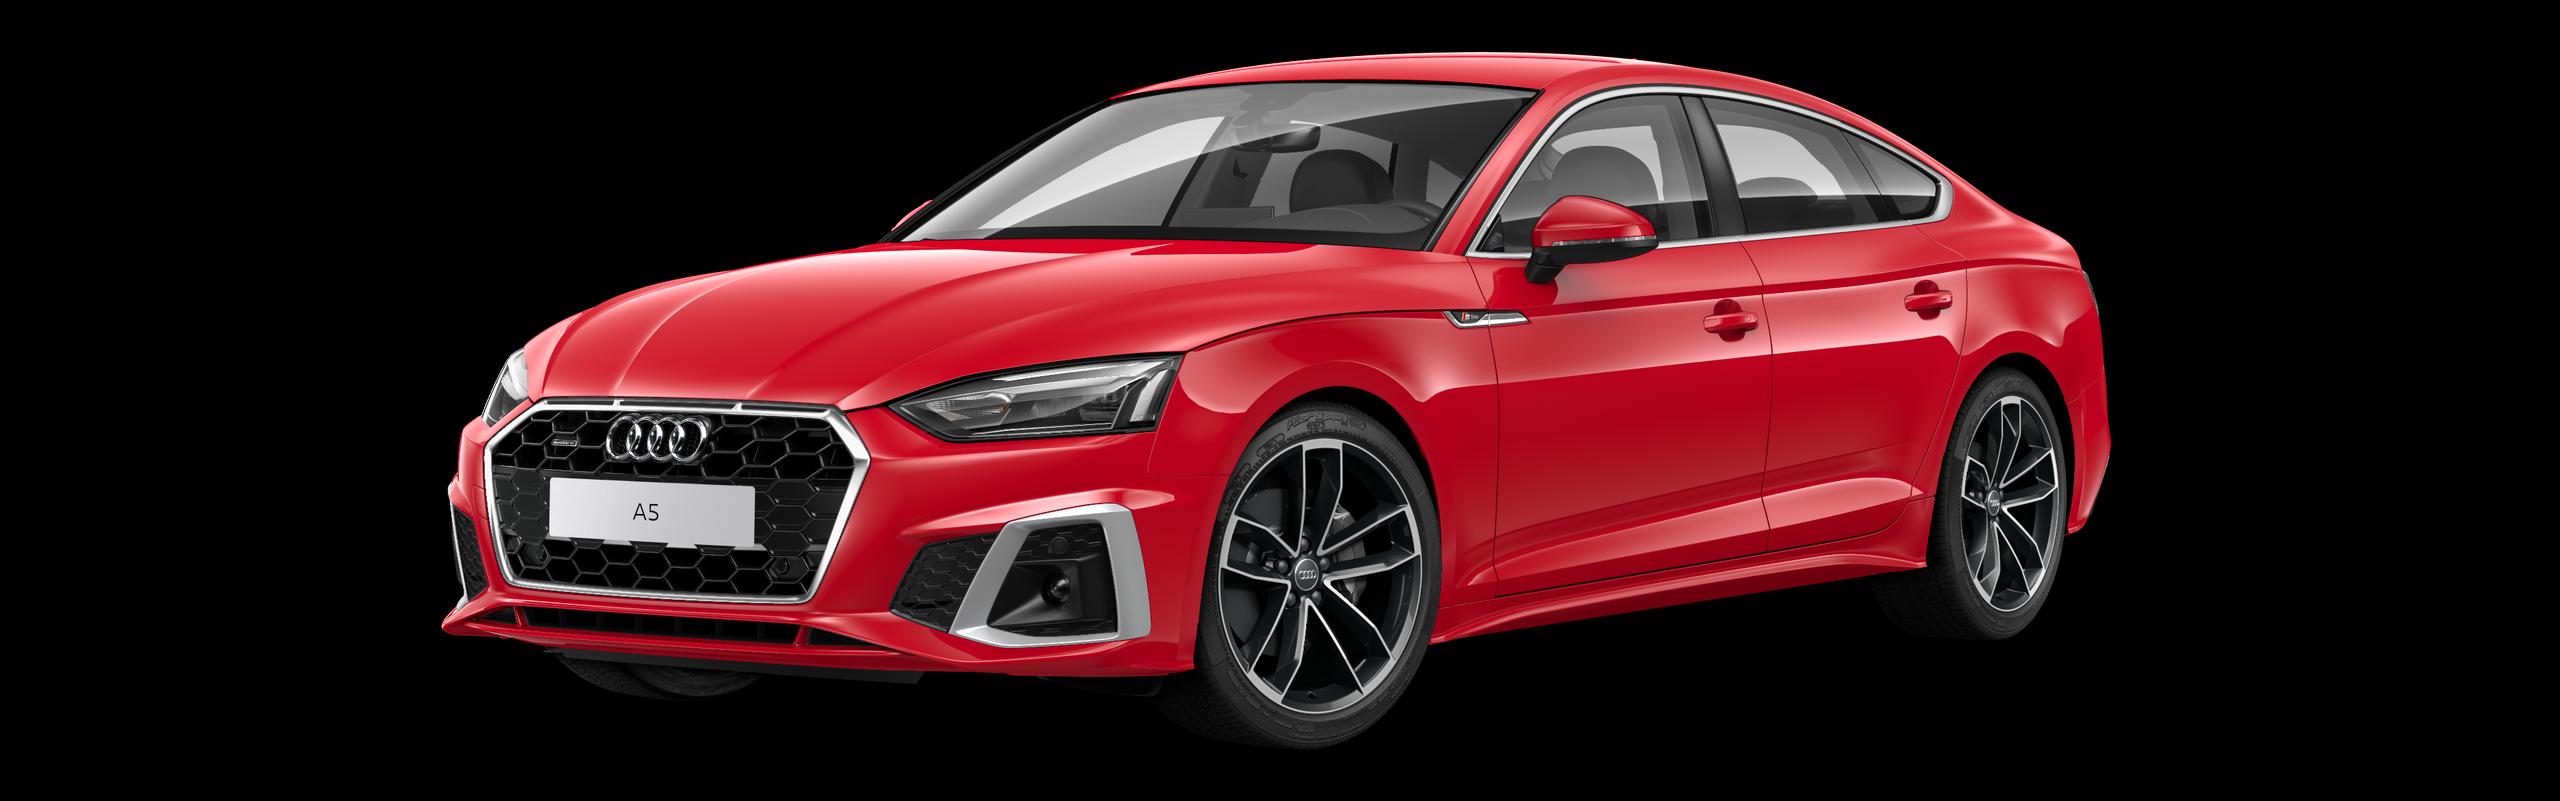 AUDI A5 SPORTBACK 40 TDI QUATTRO S-TRONIC S-LINE - červená Tango metalíza